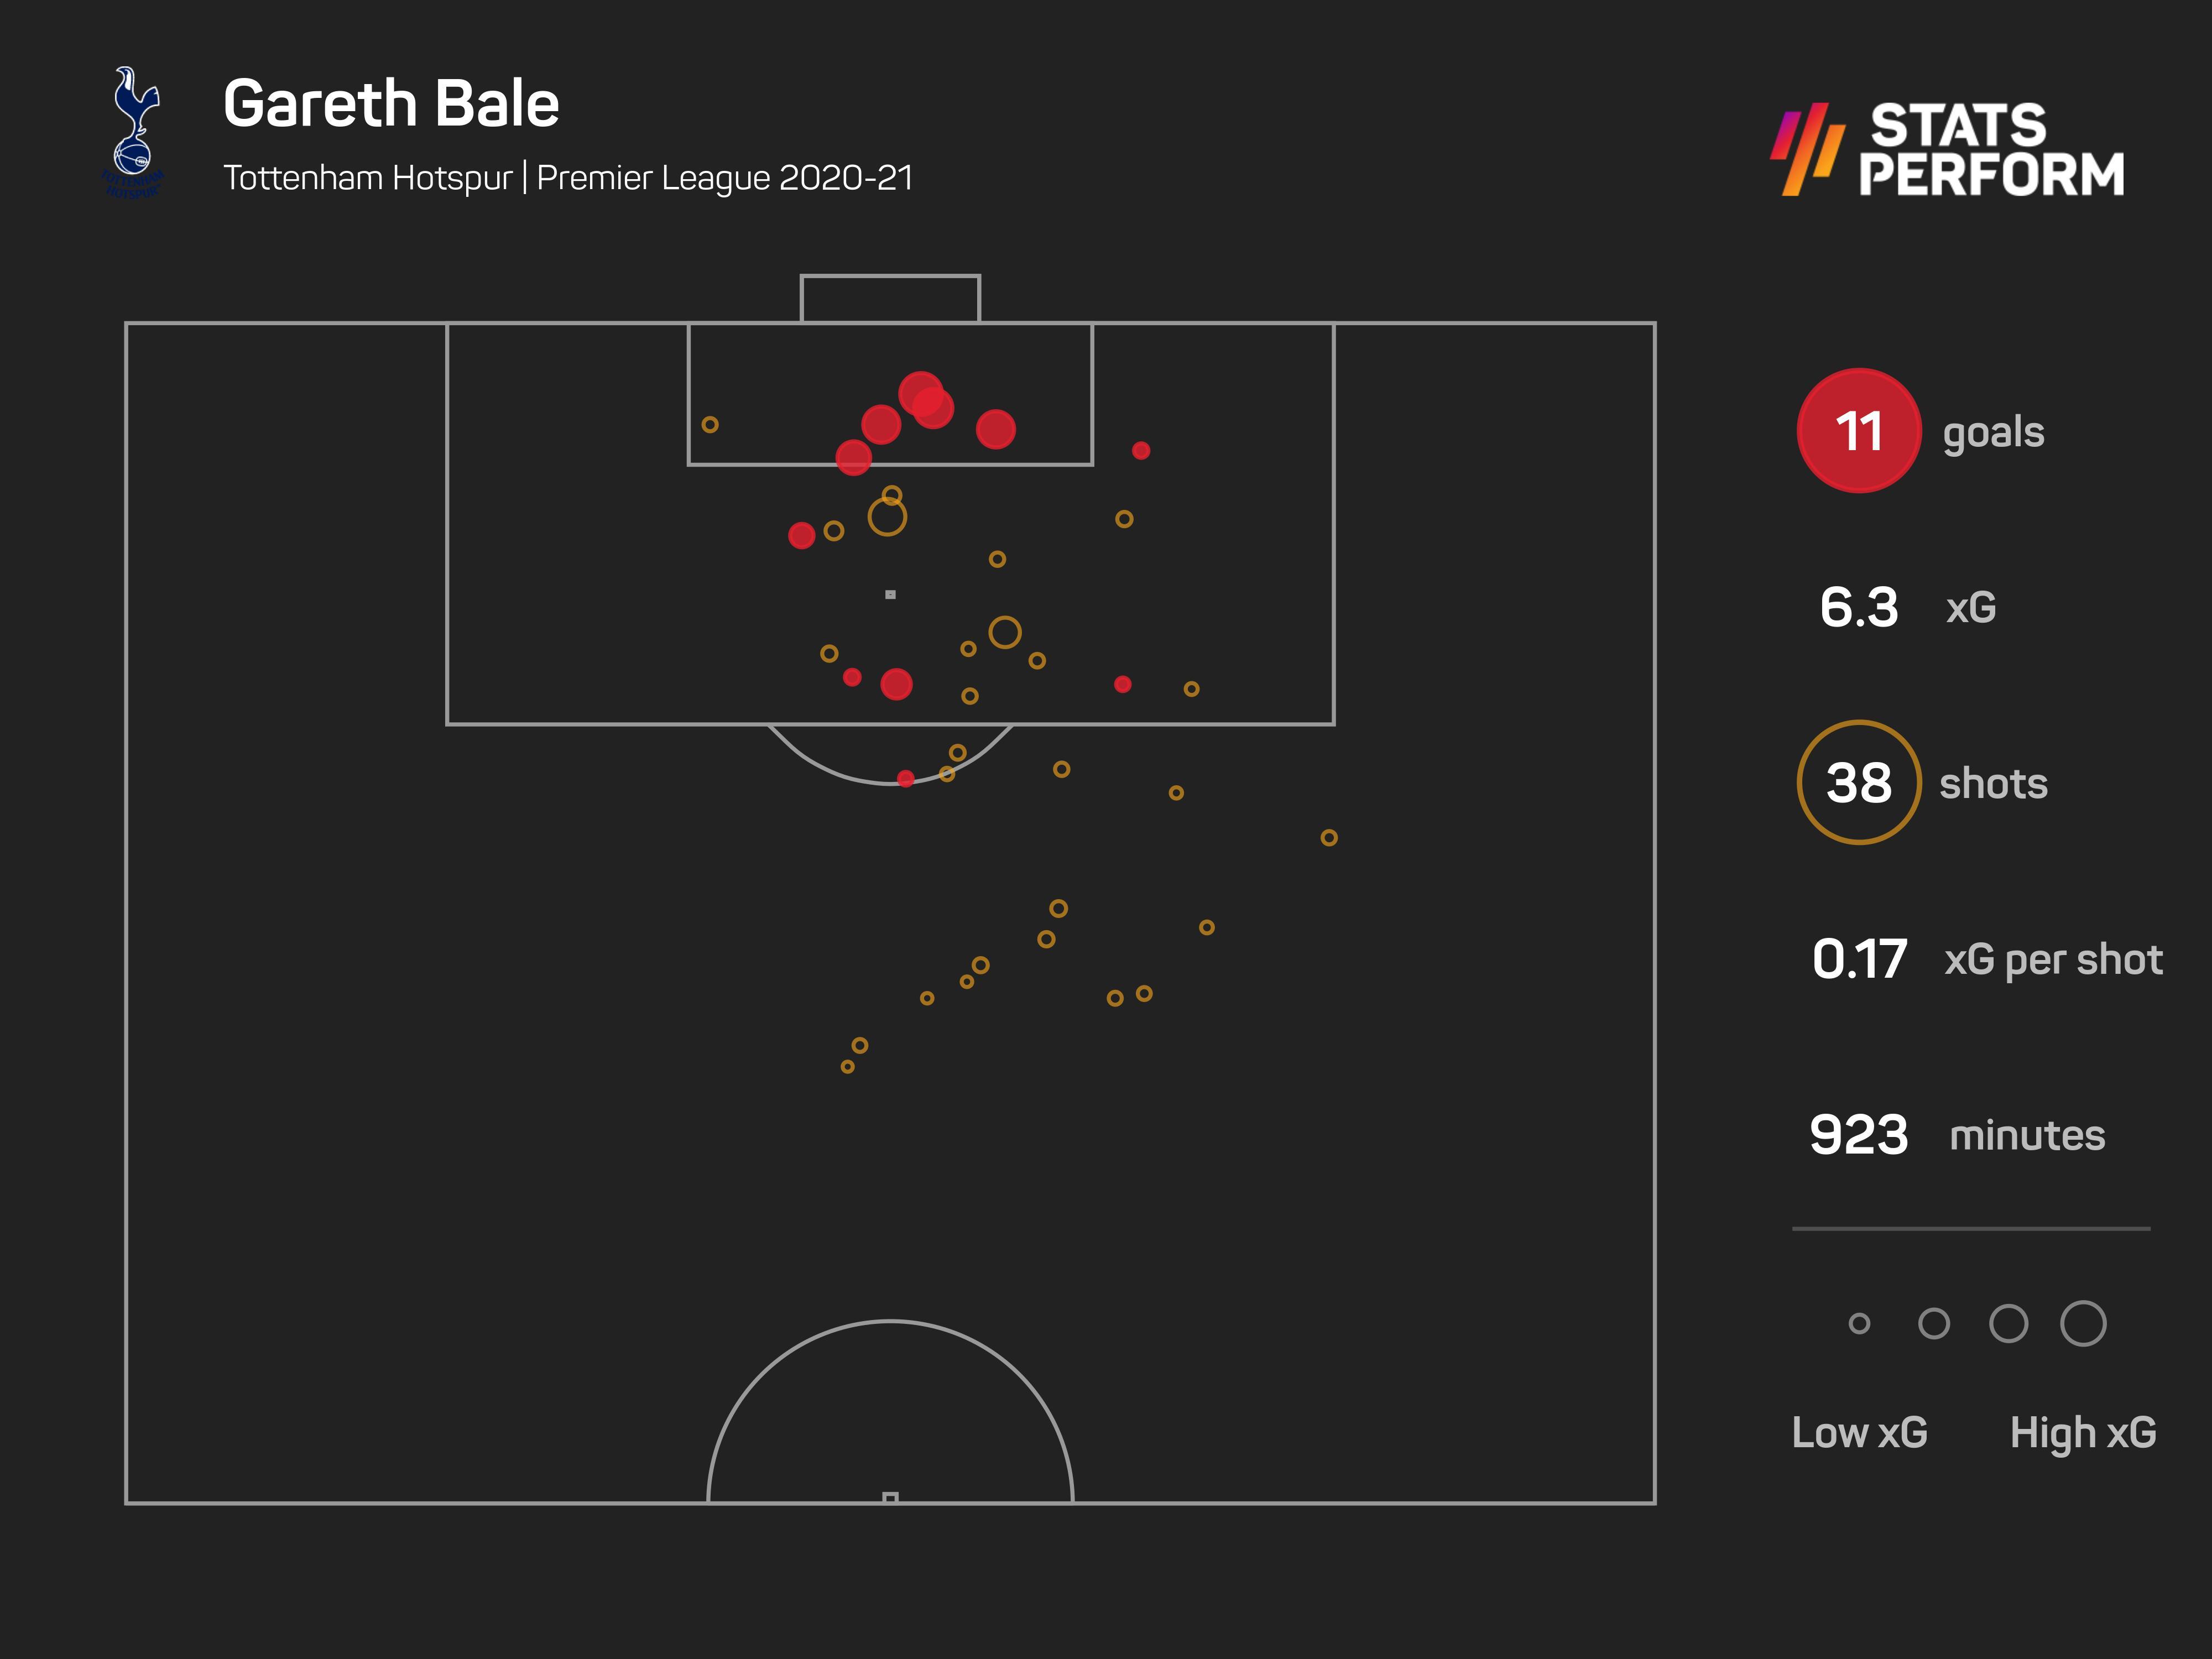 Gareth Bale xG Premier League 2020-21